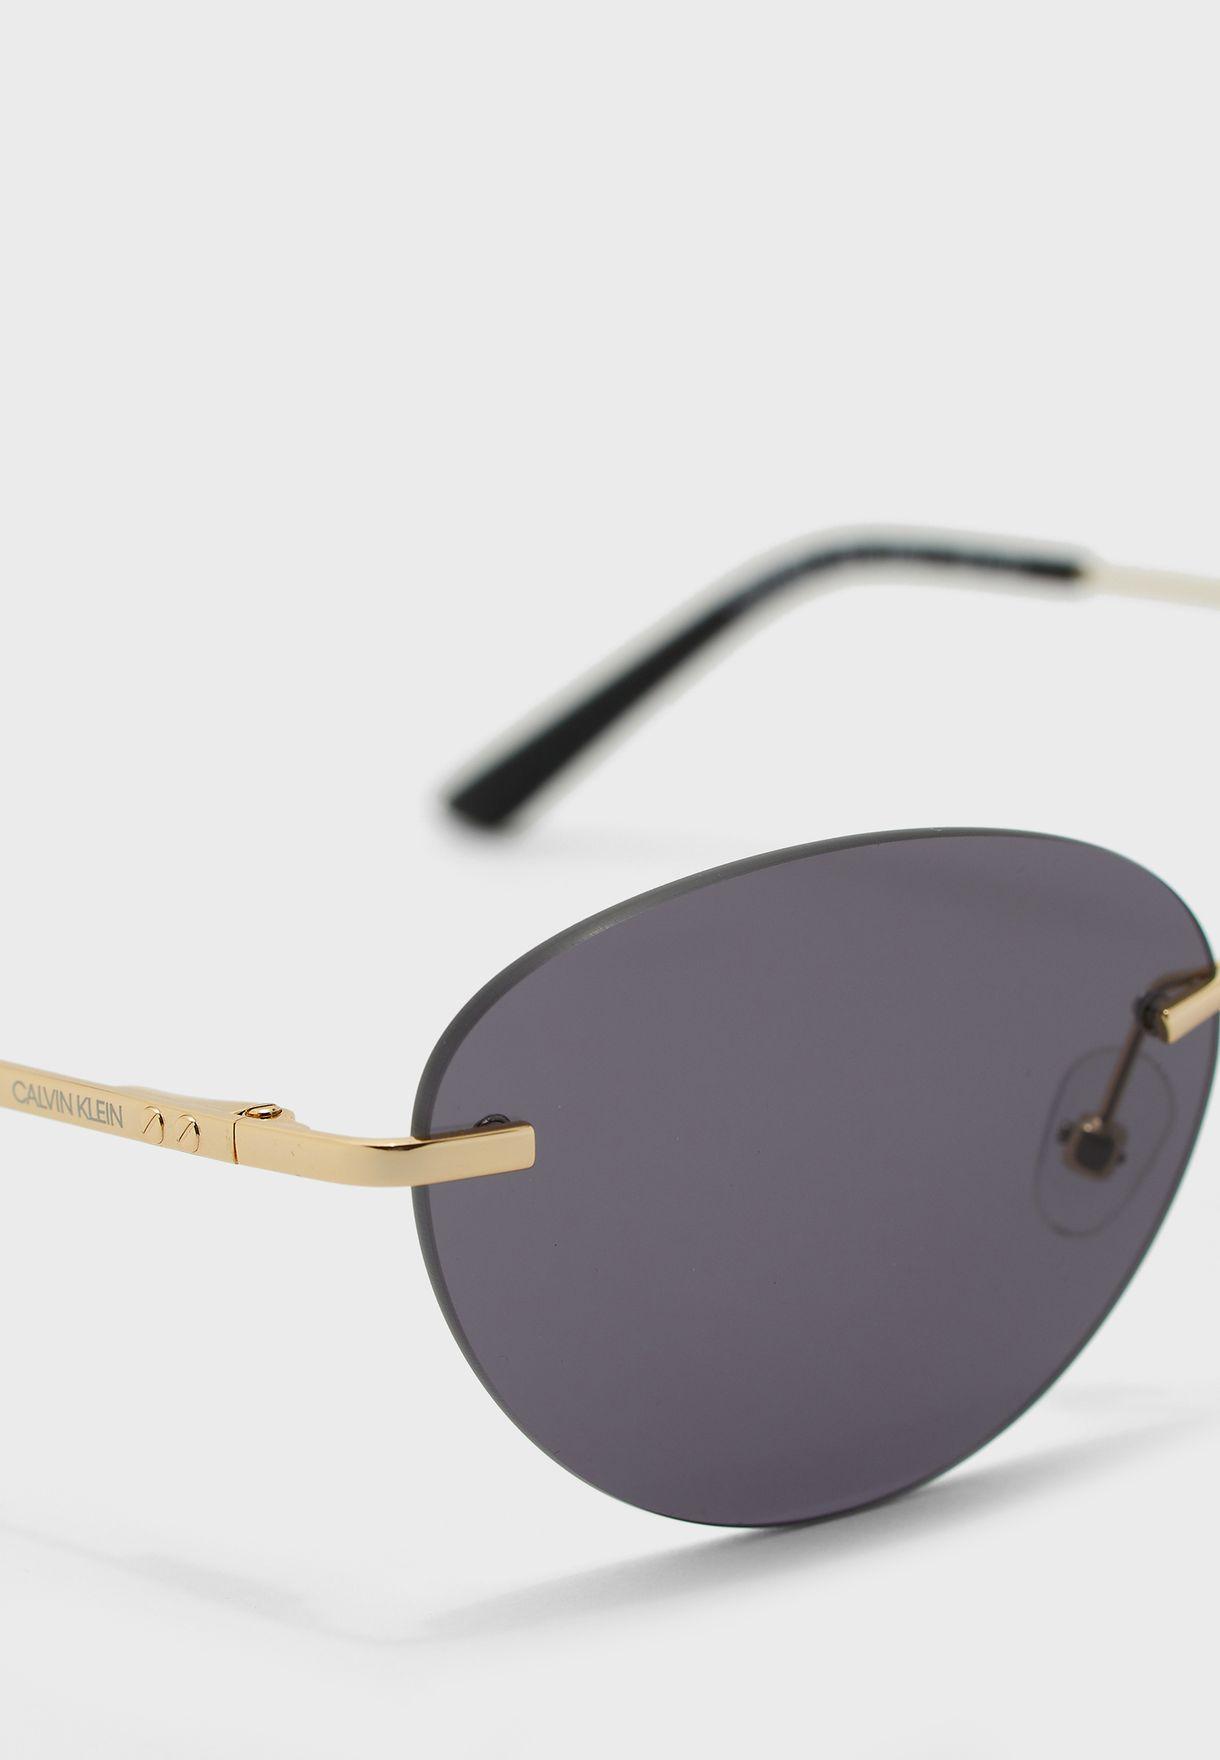 CK20102S Oval Sunglasses